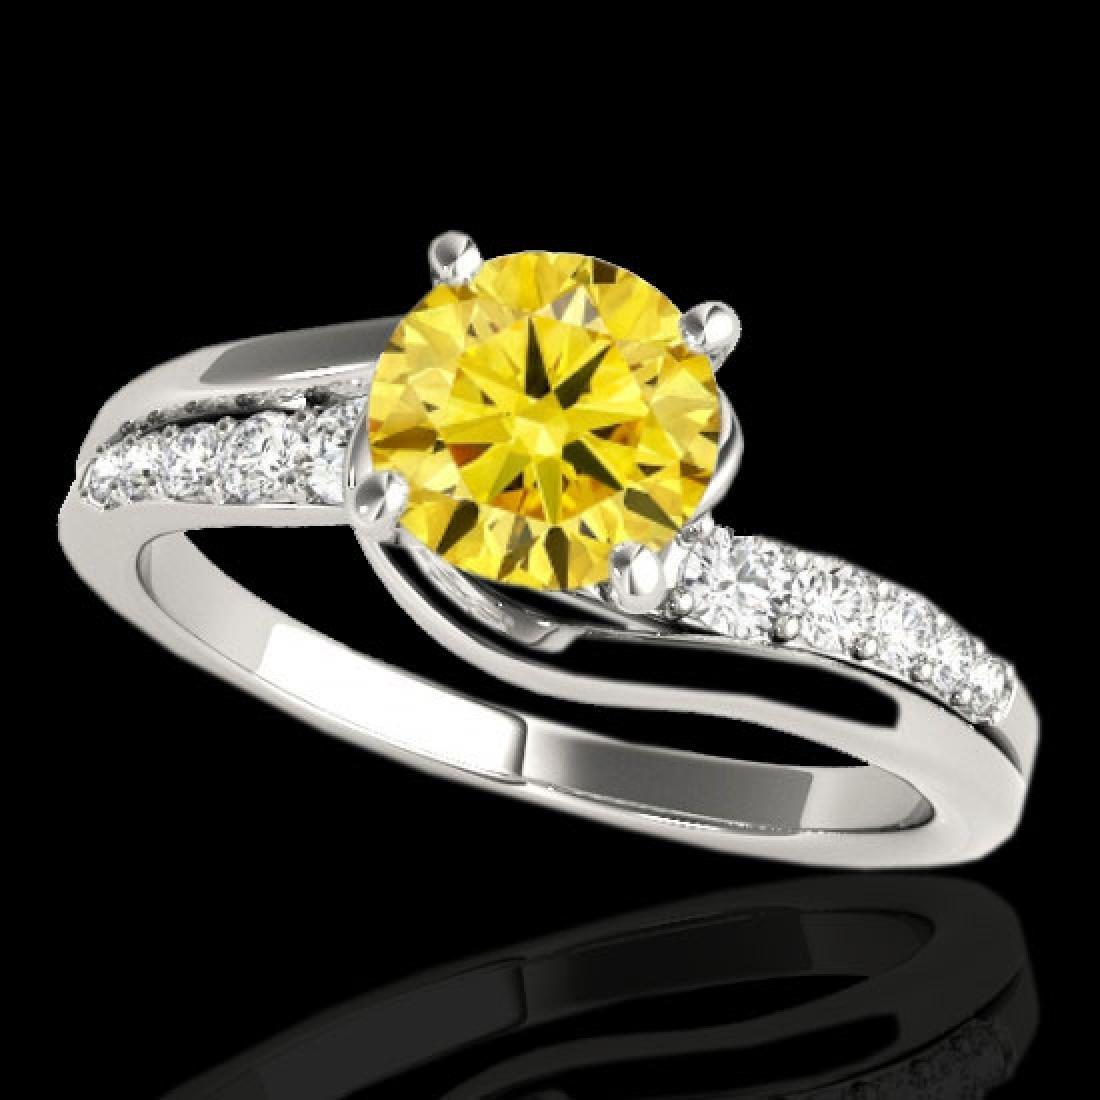 1.31 CTW Certified Si Intense Yellow Diamond Bypass